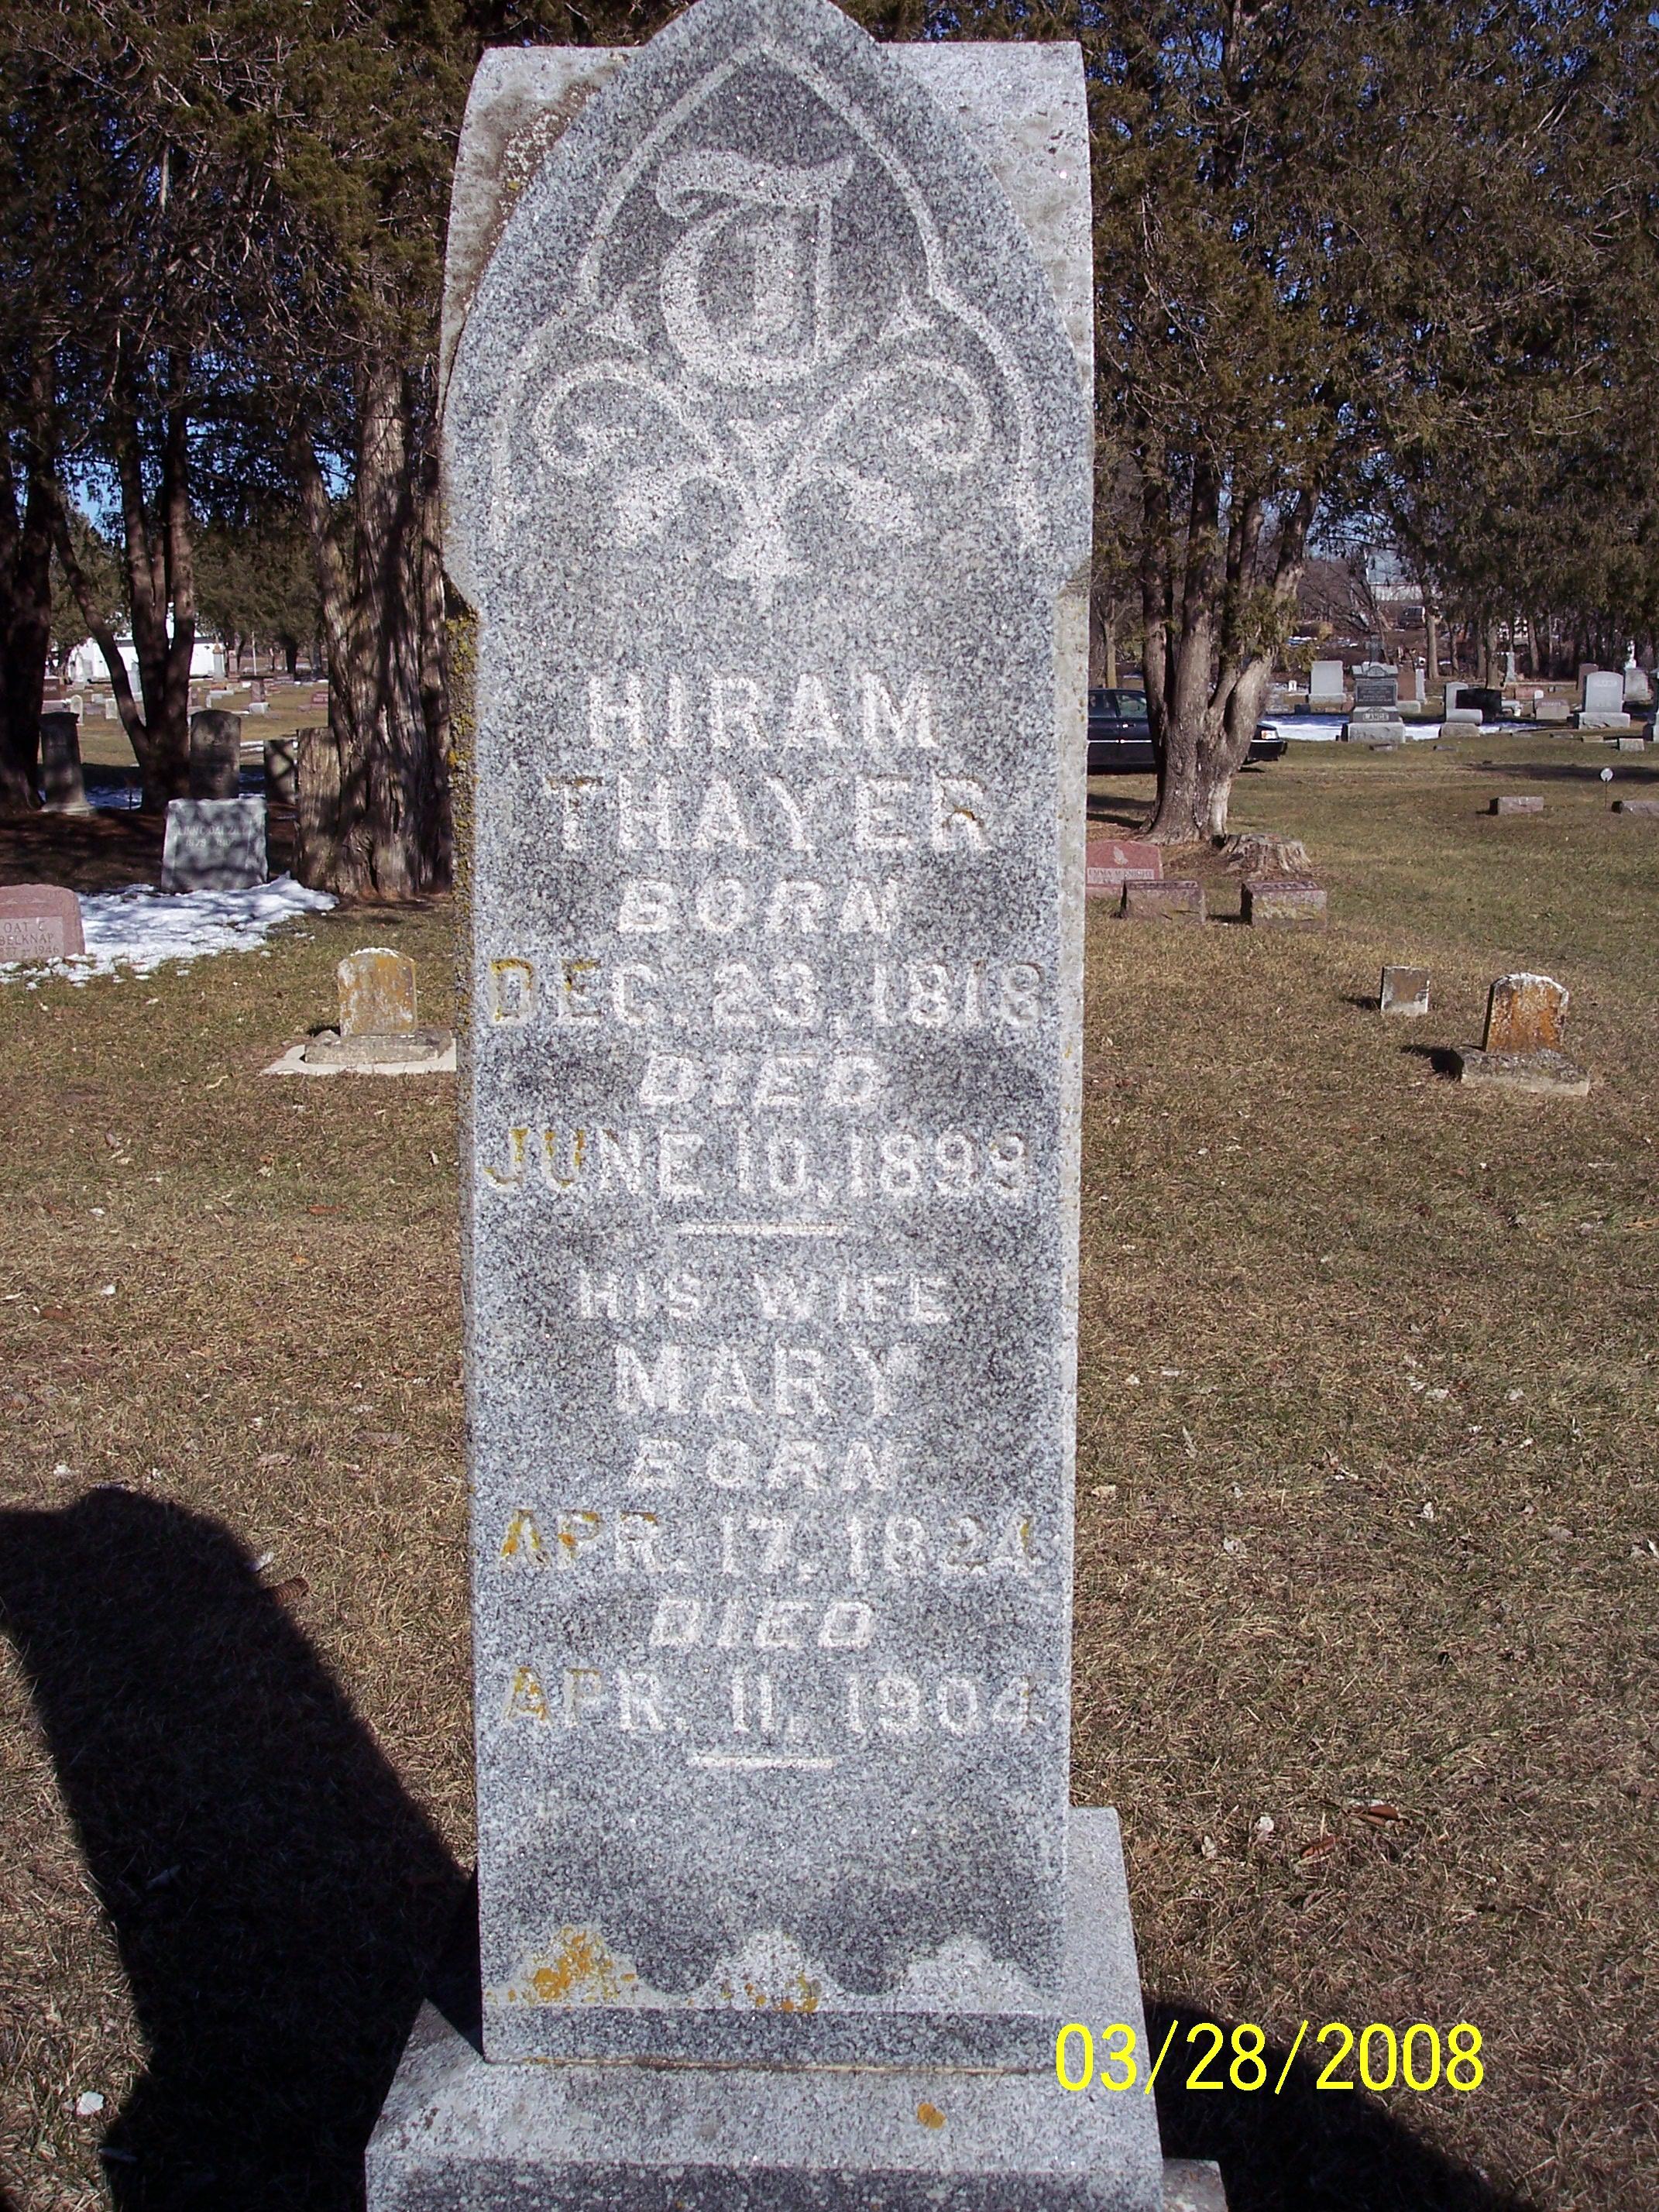 Hiram Elmer Thayer